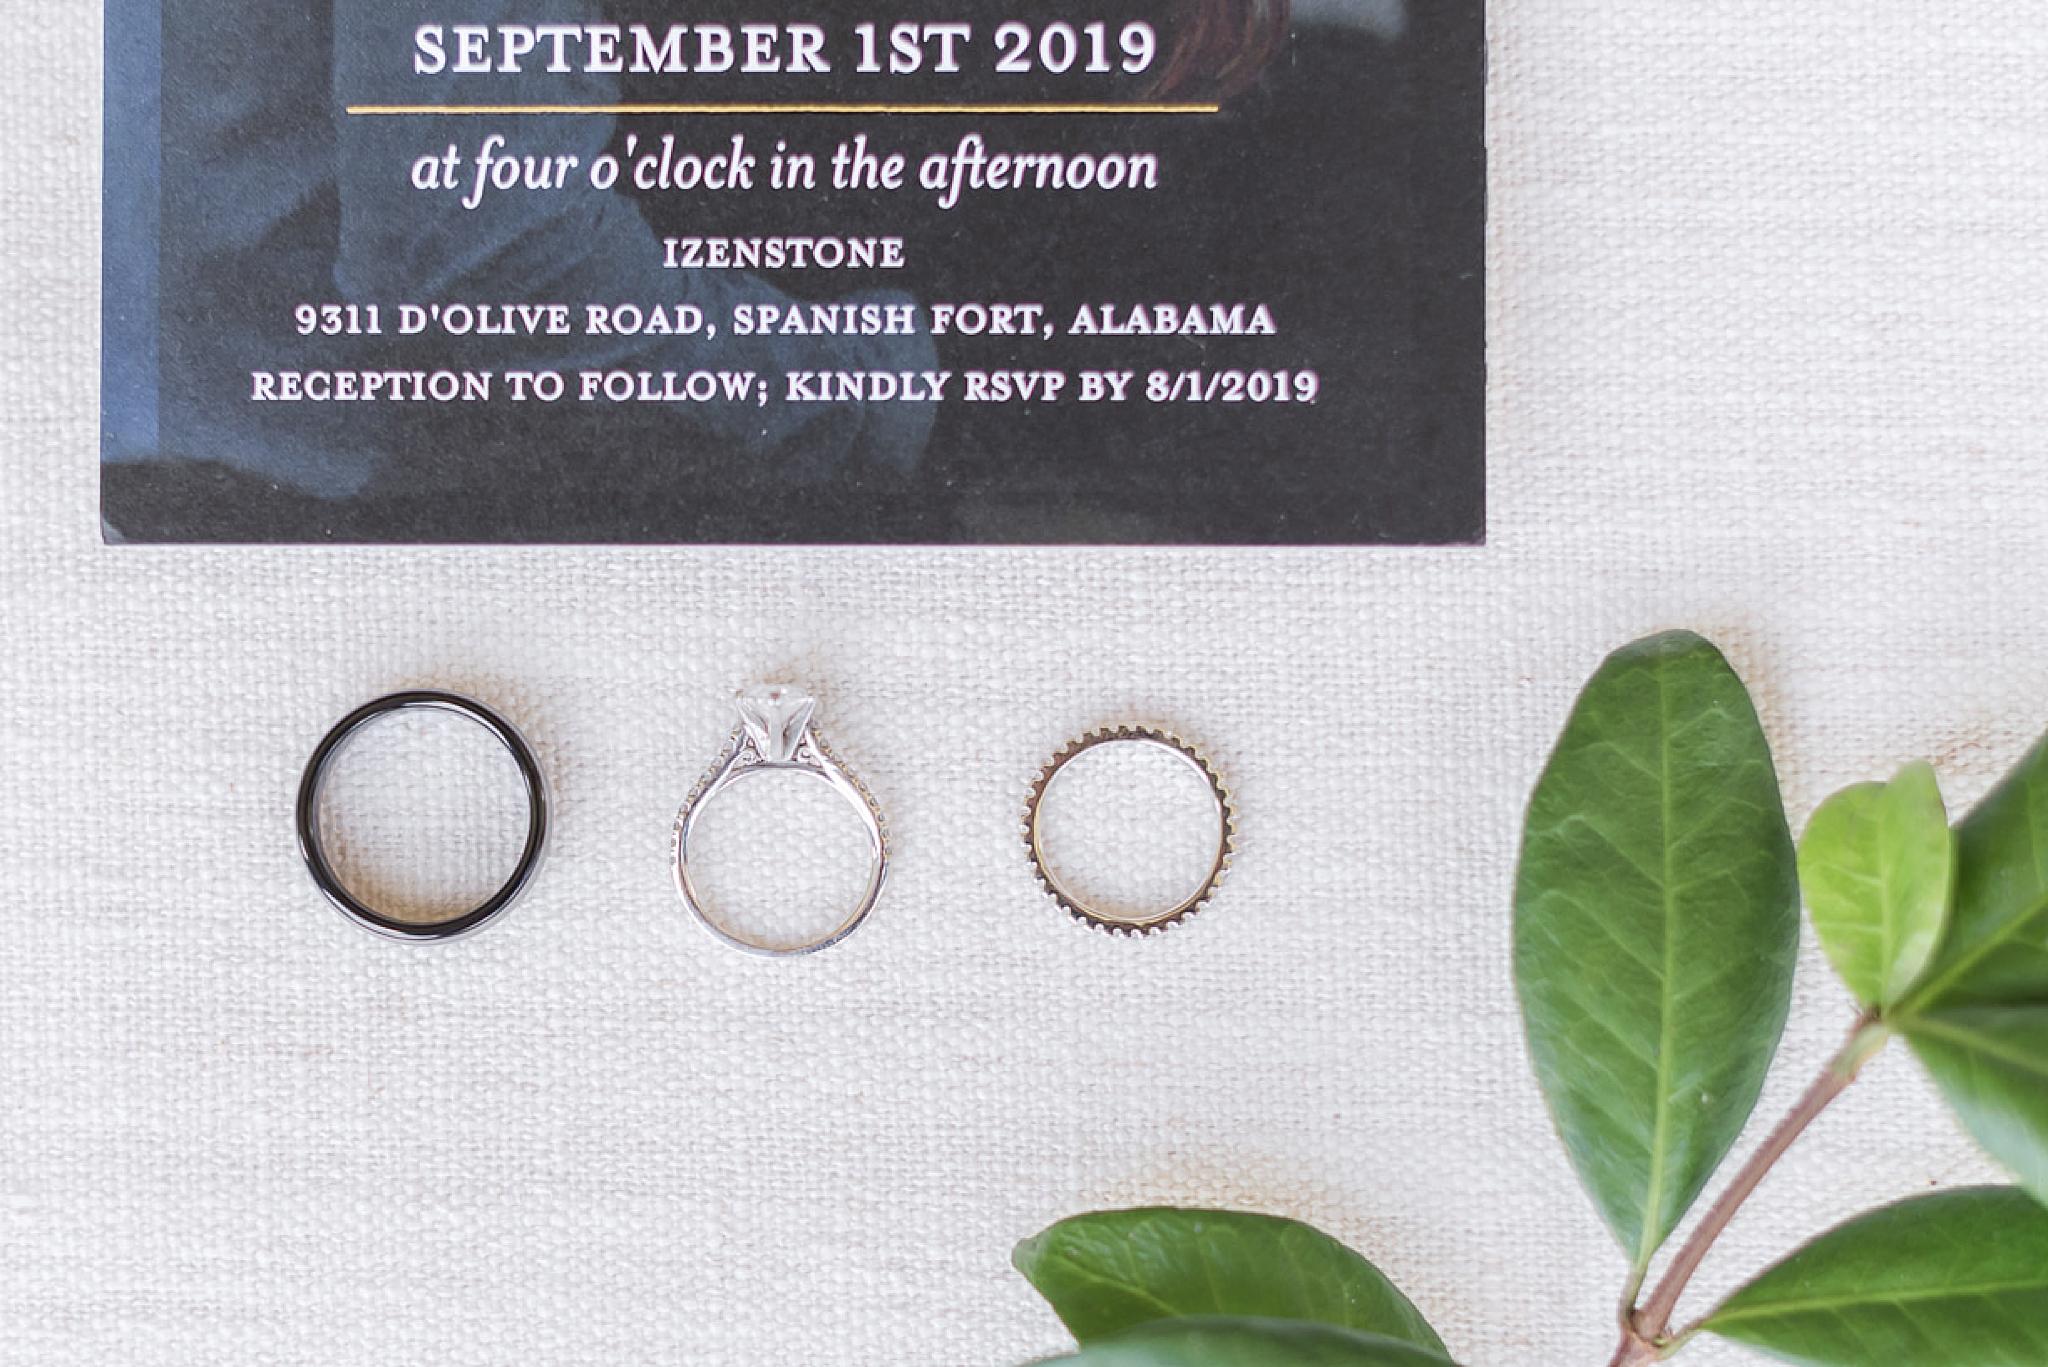 wedding rings lay beneath invitation for fall wedding